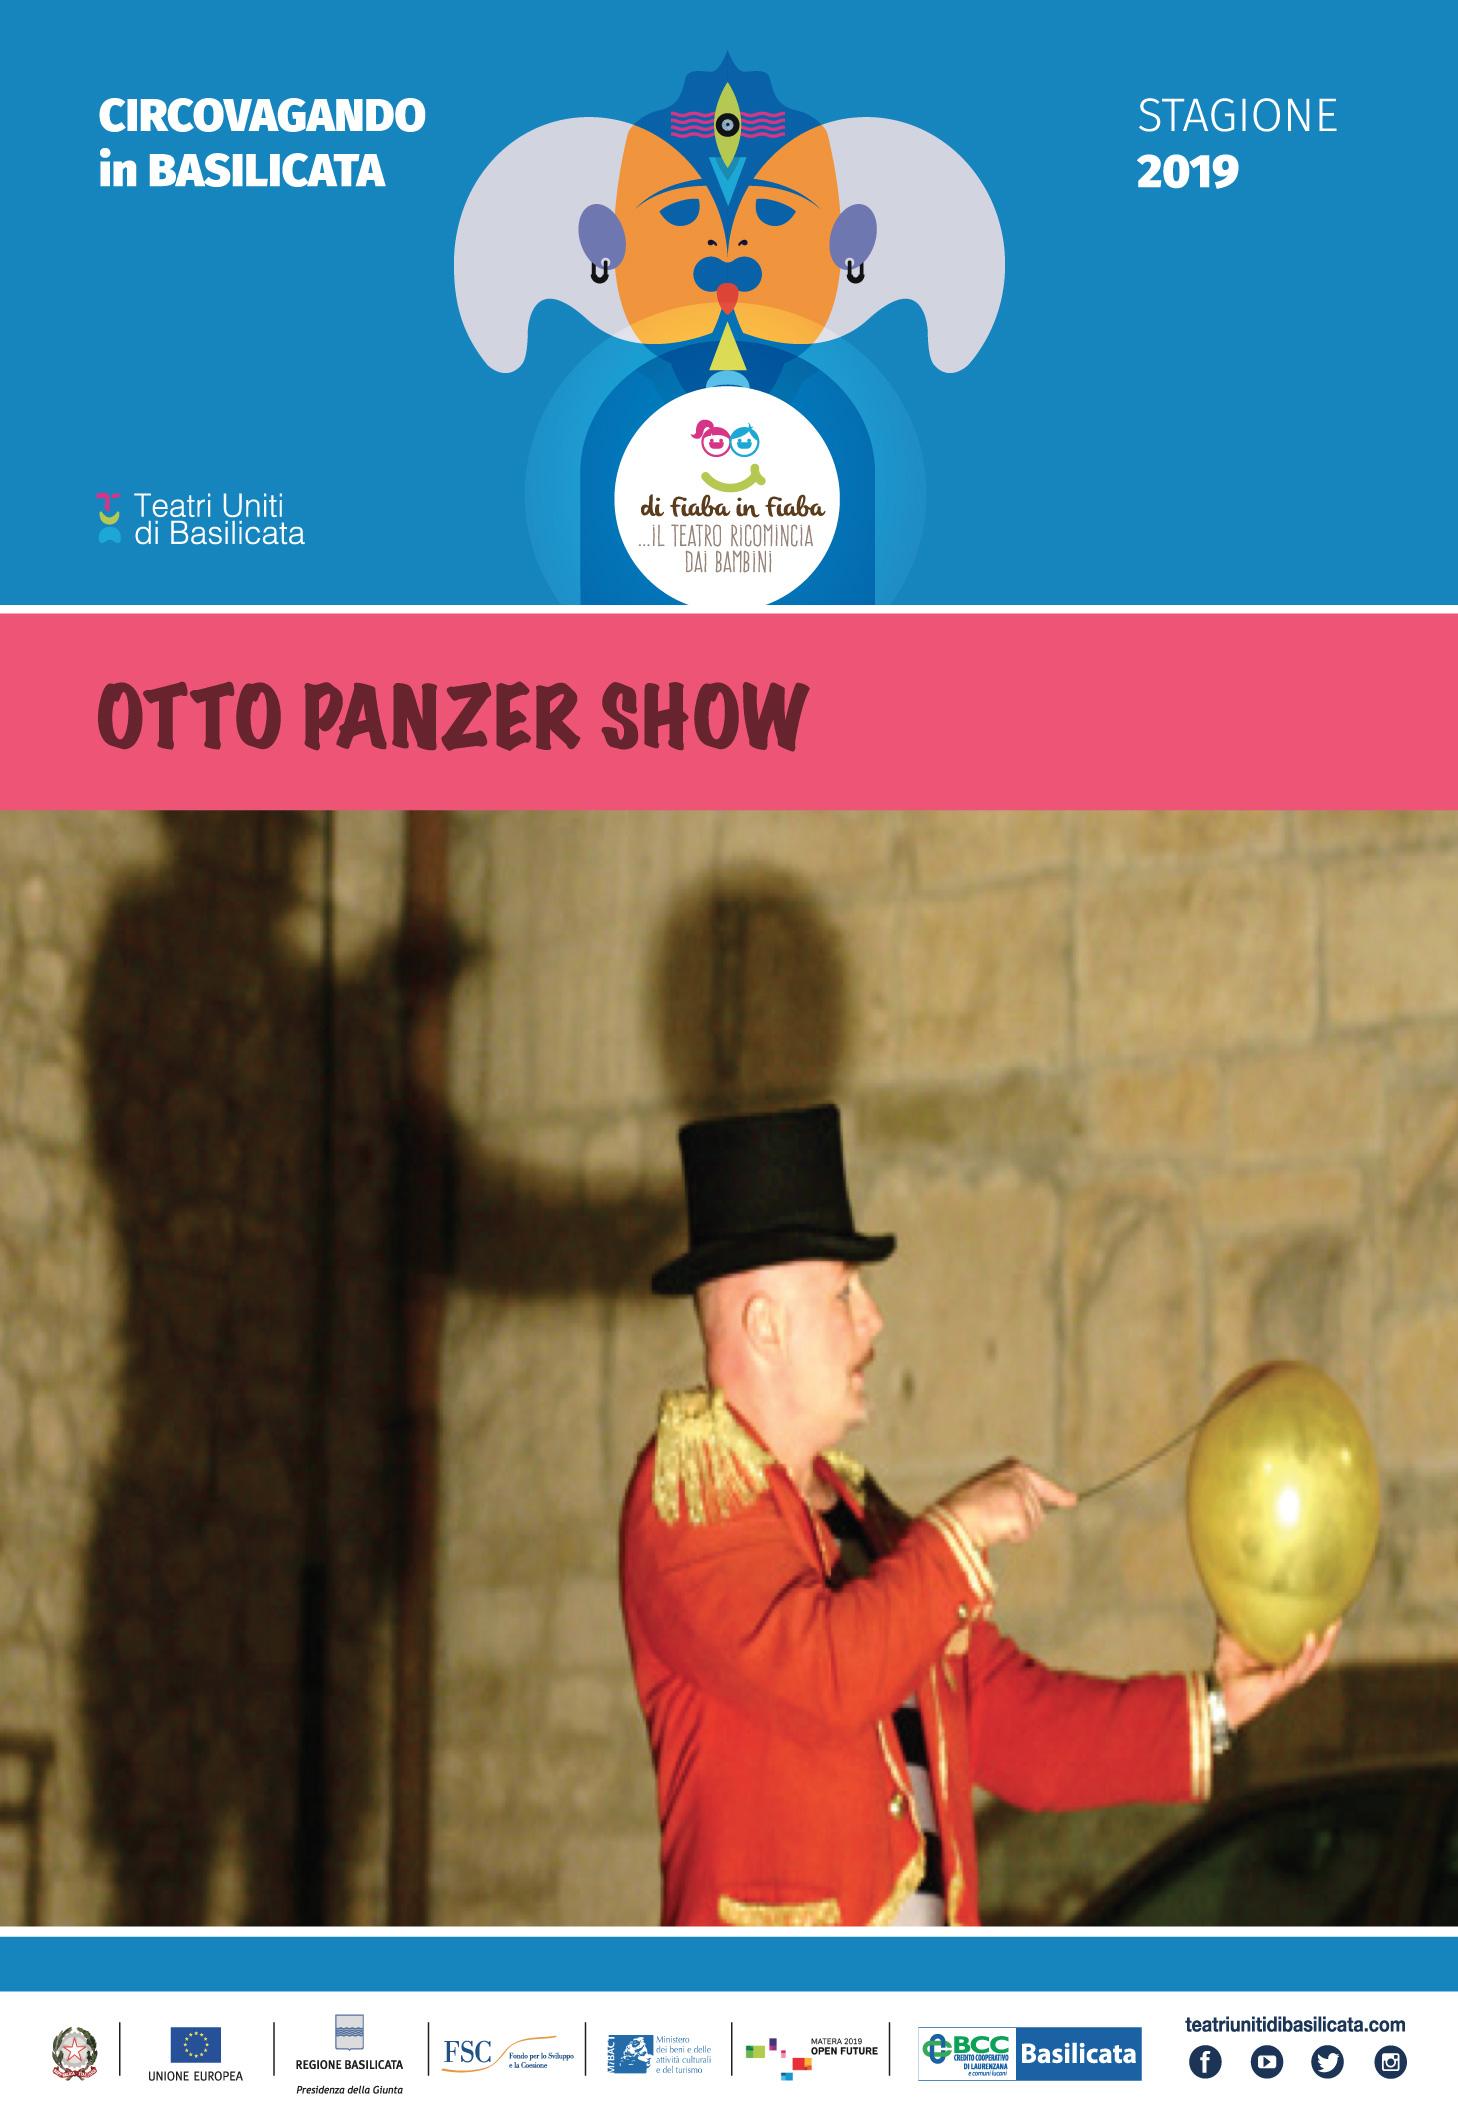 OTTO PANZER SHOW